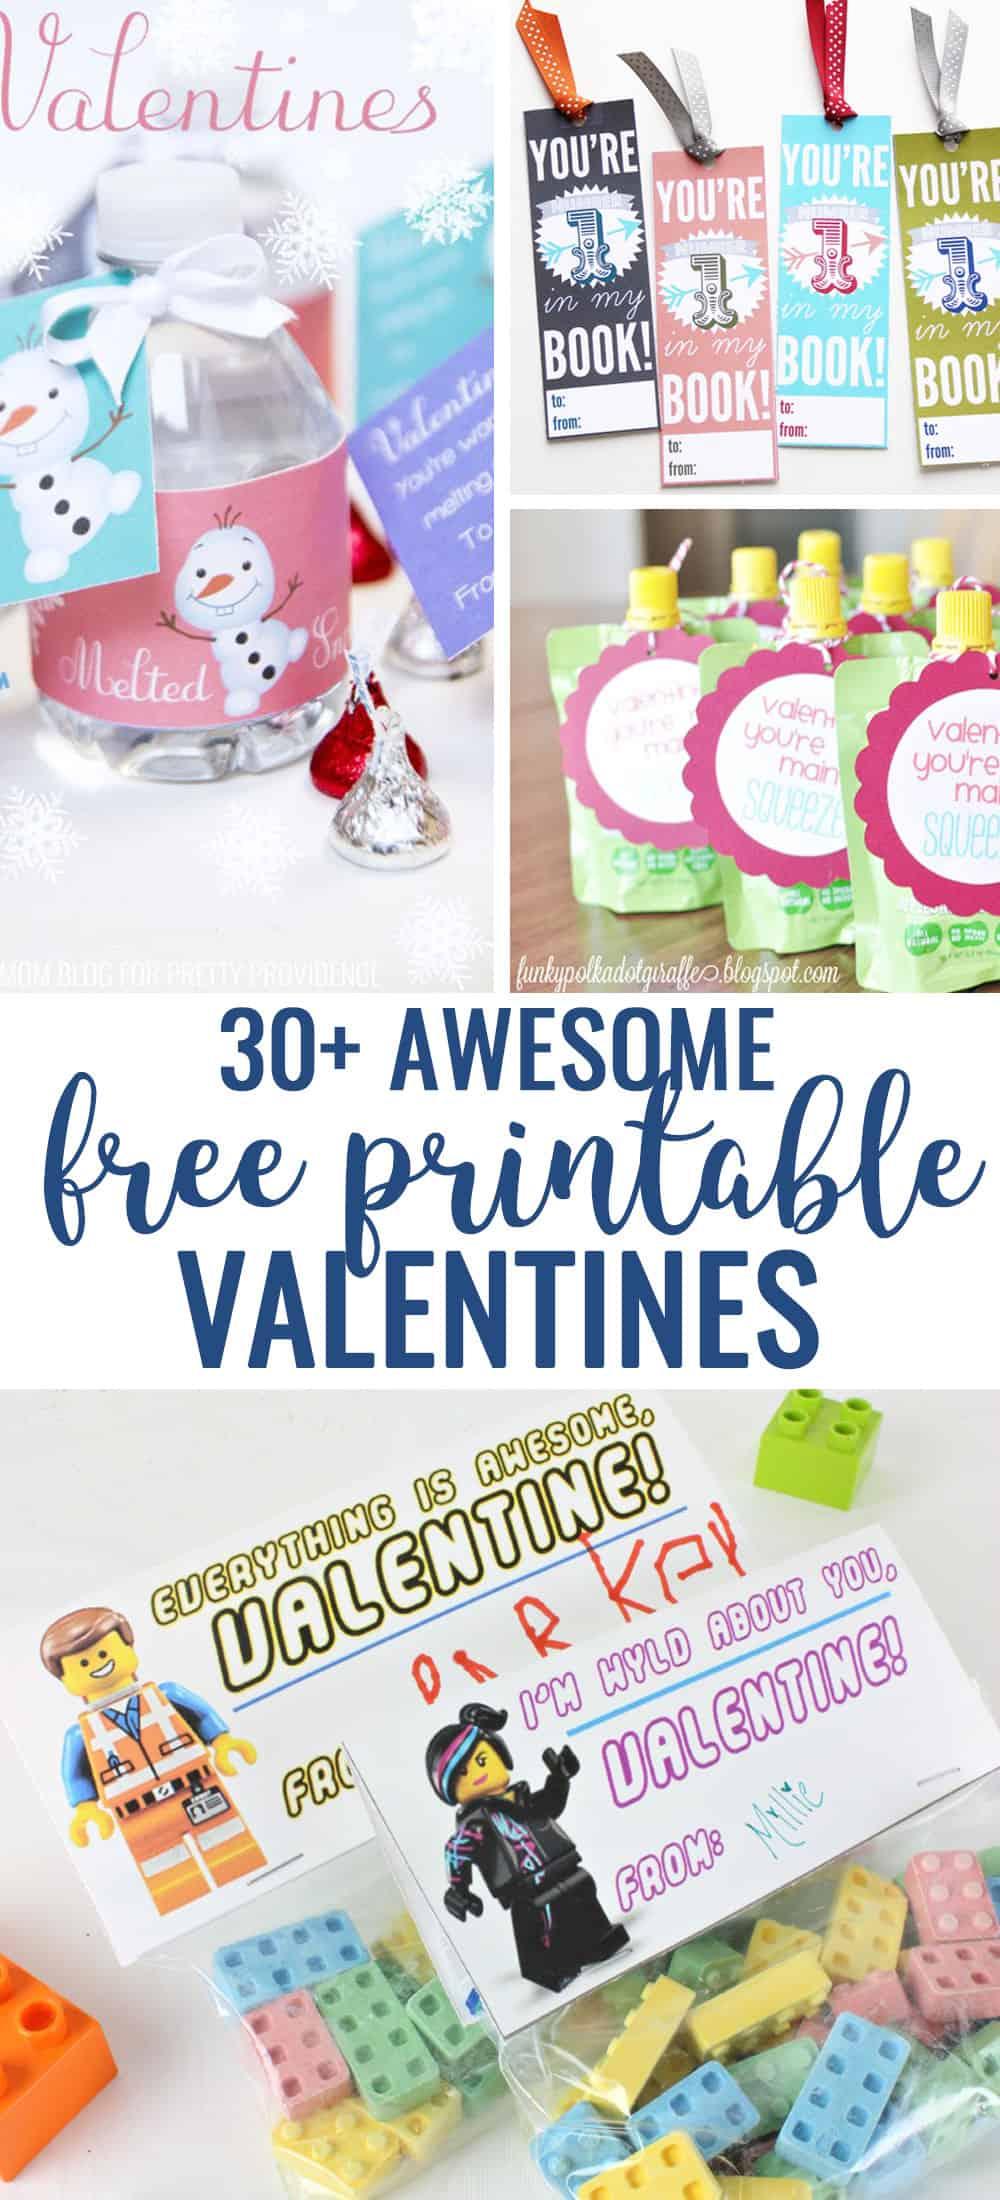 Free printable Valentines ideas - great ideas for classroom Valentines and for kids! #valentines #valentinesday #printable #freeprintablevalentines #printablevalentines #valentinesforkids #valentinesideas #classroomvalentines #freeprintables